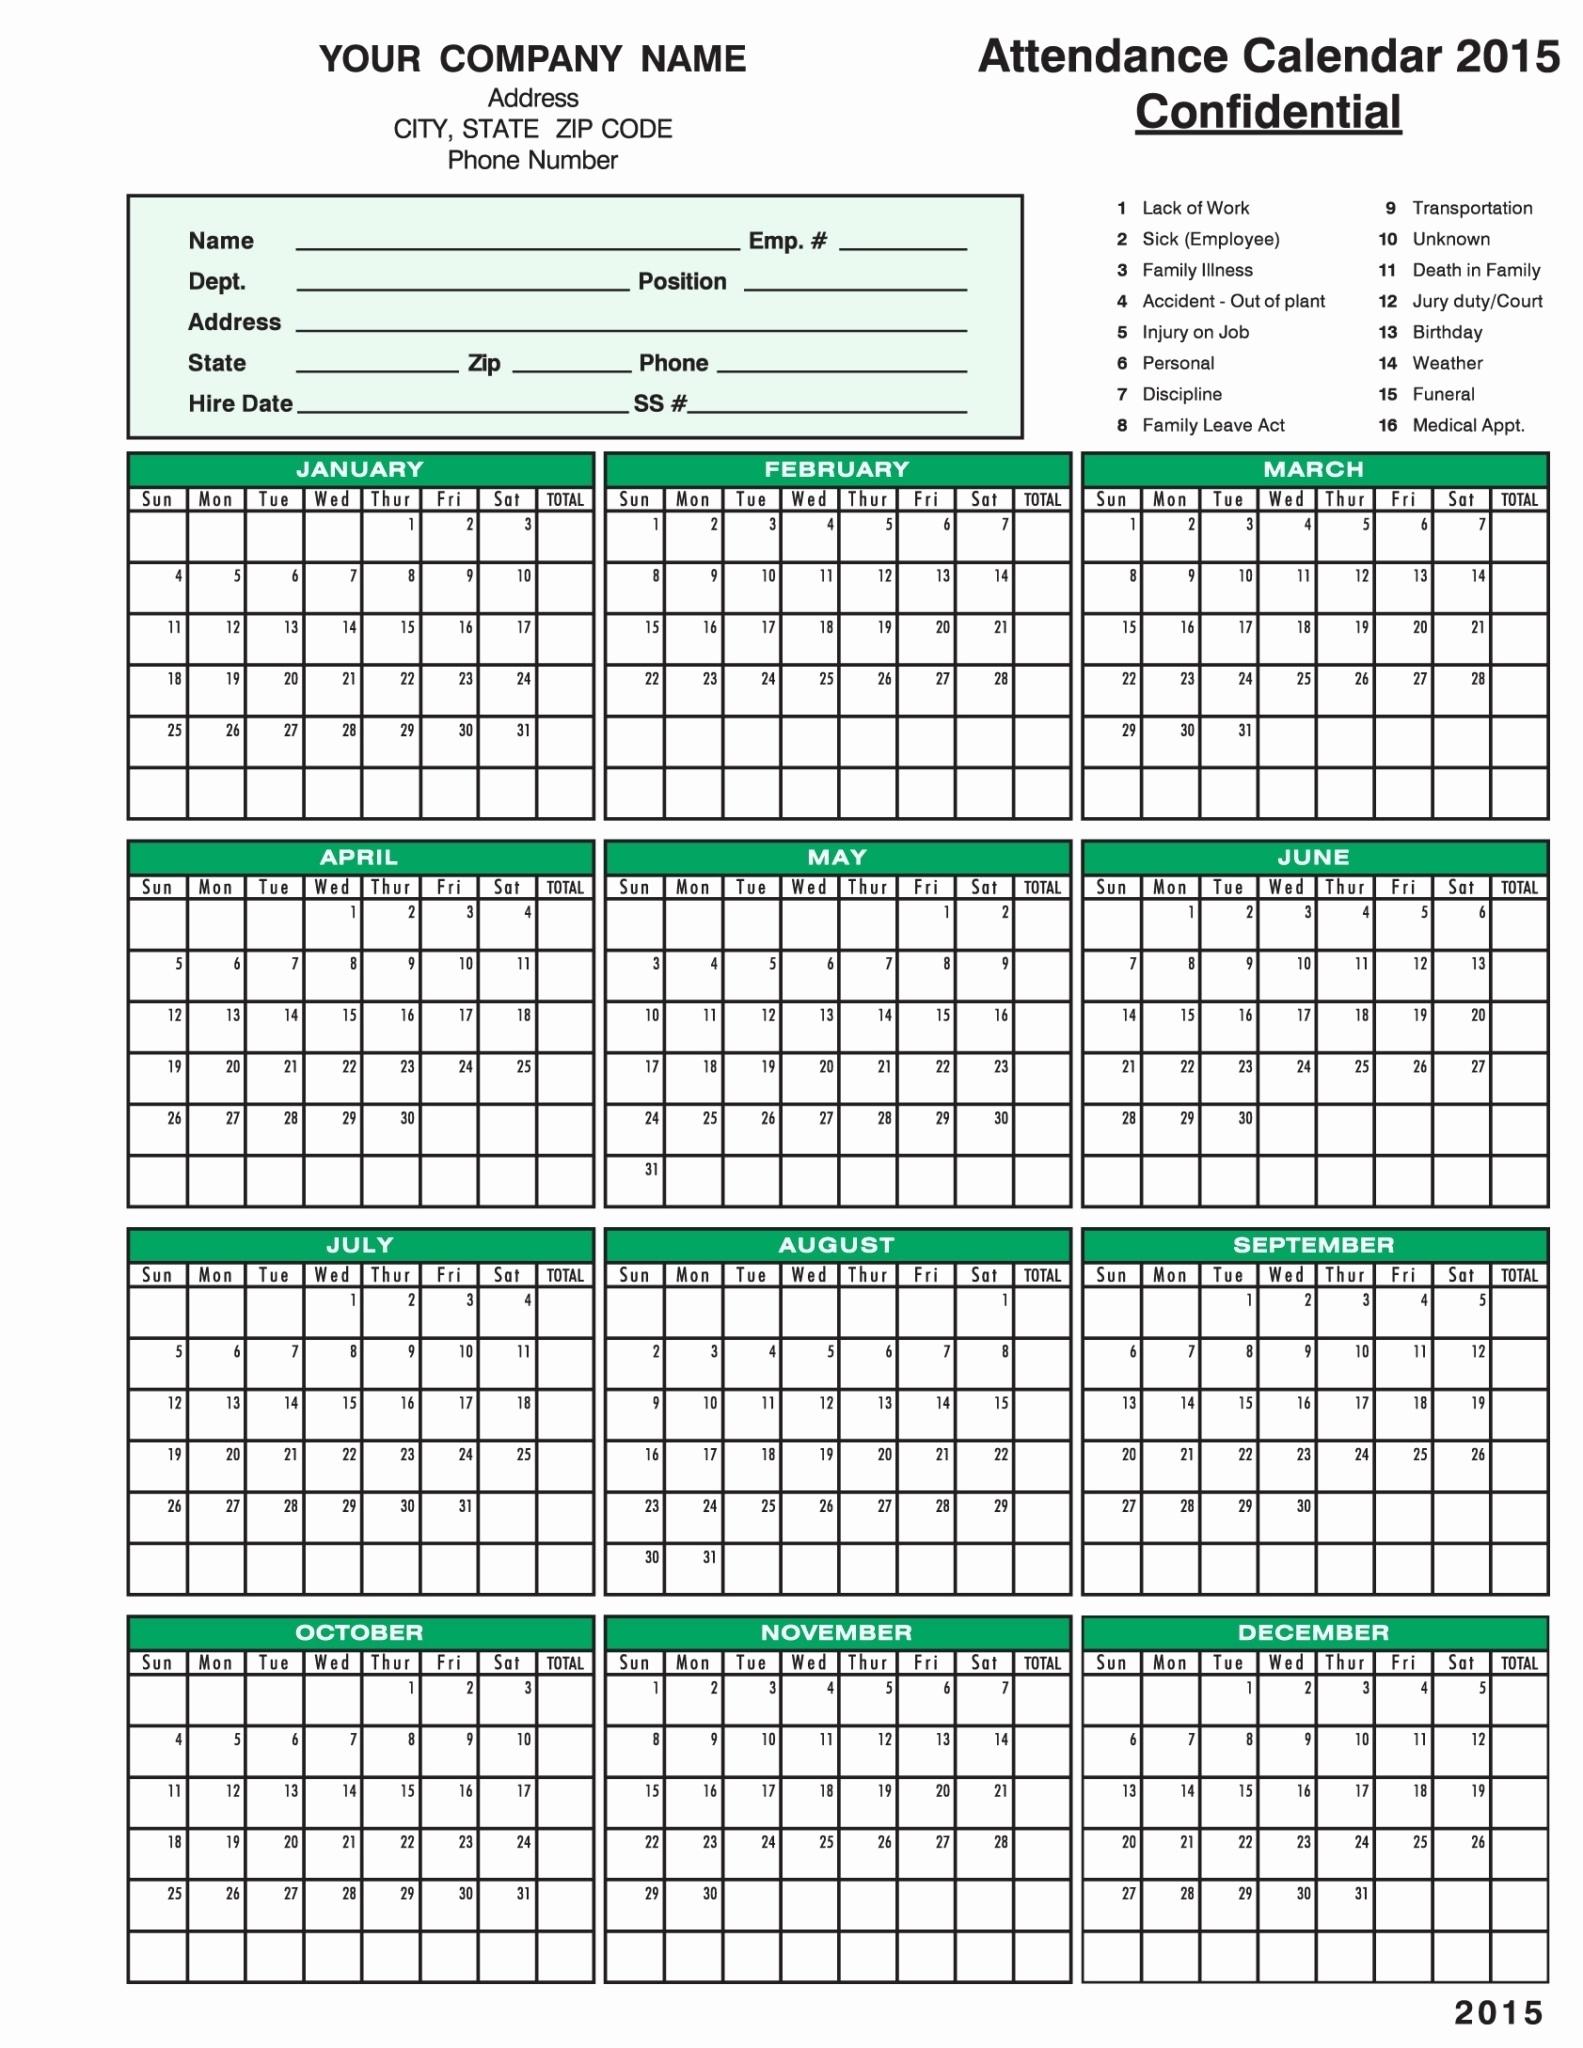 Take Free Attendance Calendar Printable